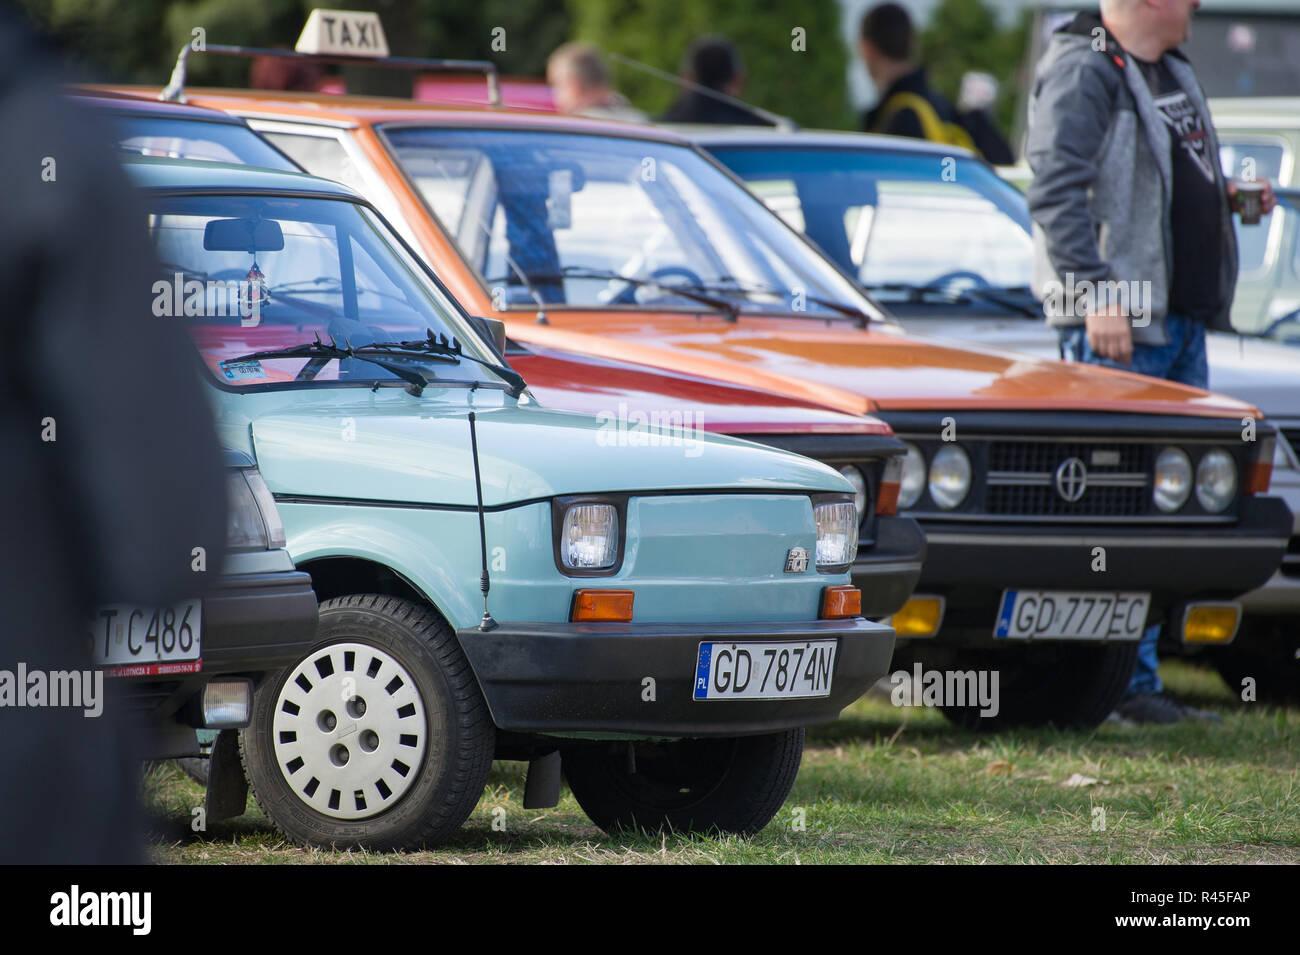 Polish automobile Polski Fiat 126p manufactured in FSM in Bielsko Biala and Tychy and FSO Polonez in Gdansk, Poland. October 21st 2018 © Wojciech Stro - Stock Image